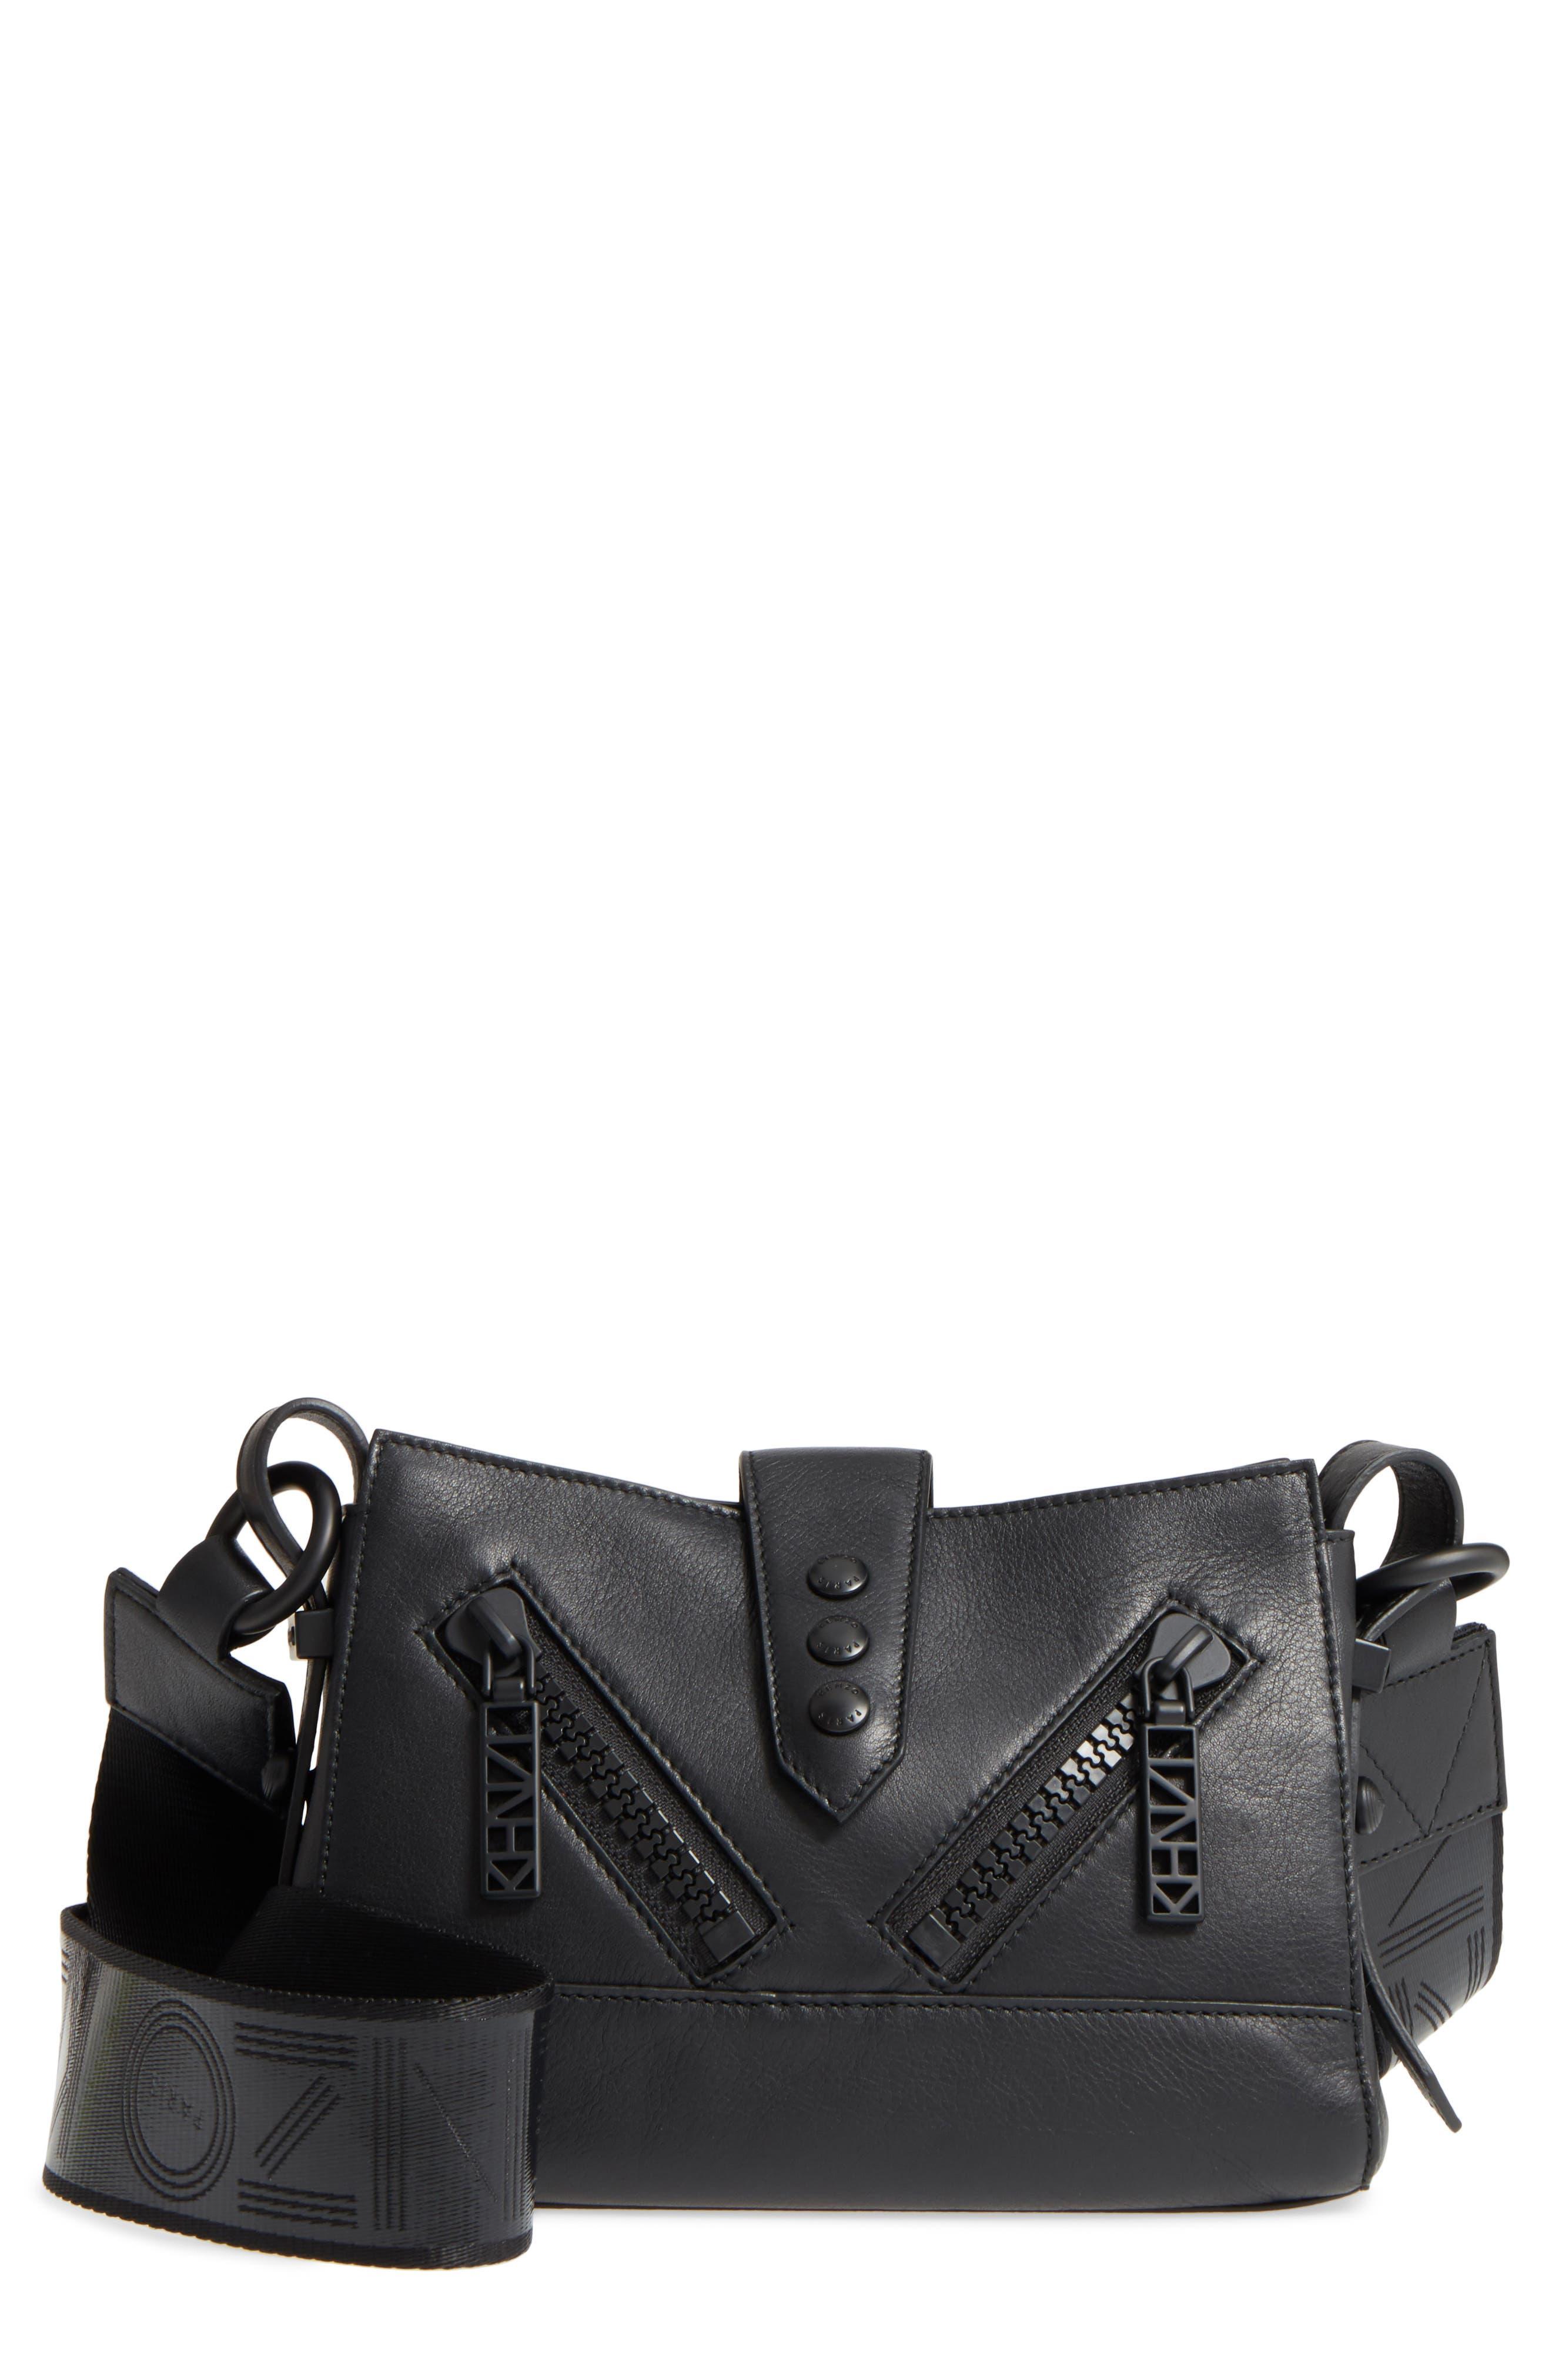 Alternate Image 1 Selected - KENZO Mini Kalifornia Leather Shoulder Bag